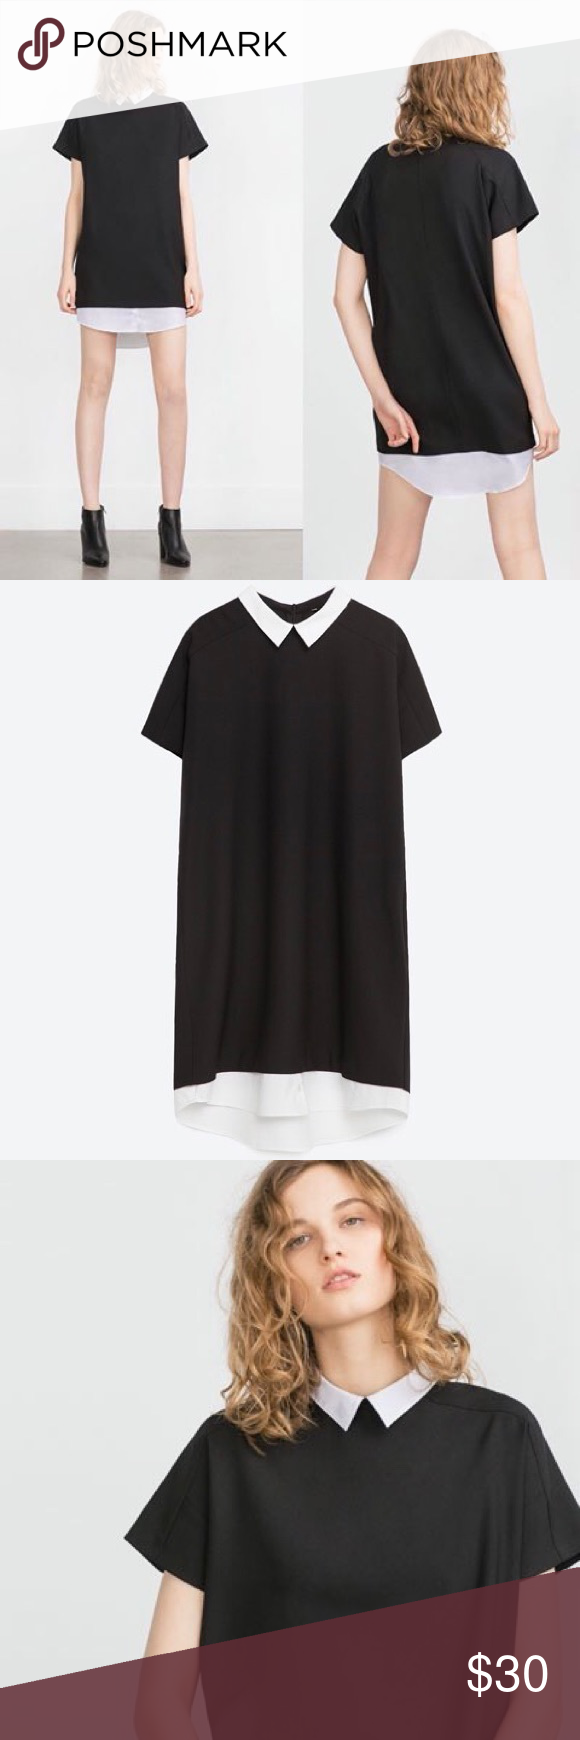 cd968fbf Zara Black Dress With White Shirt Sleeves – Little Black Dress ...